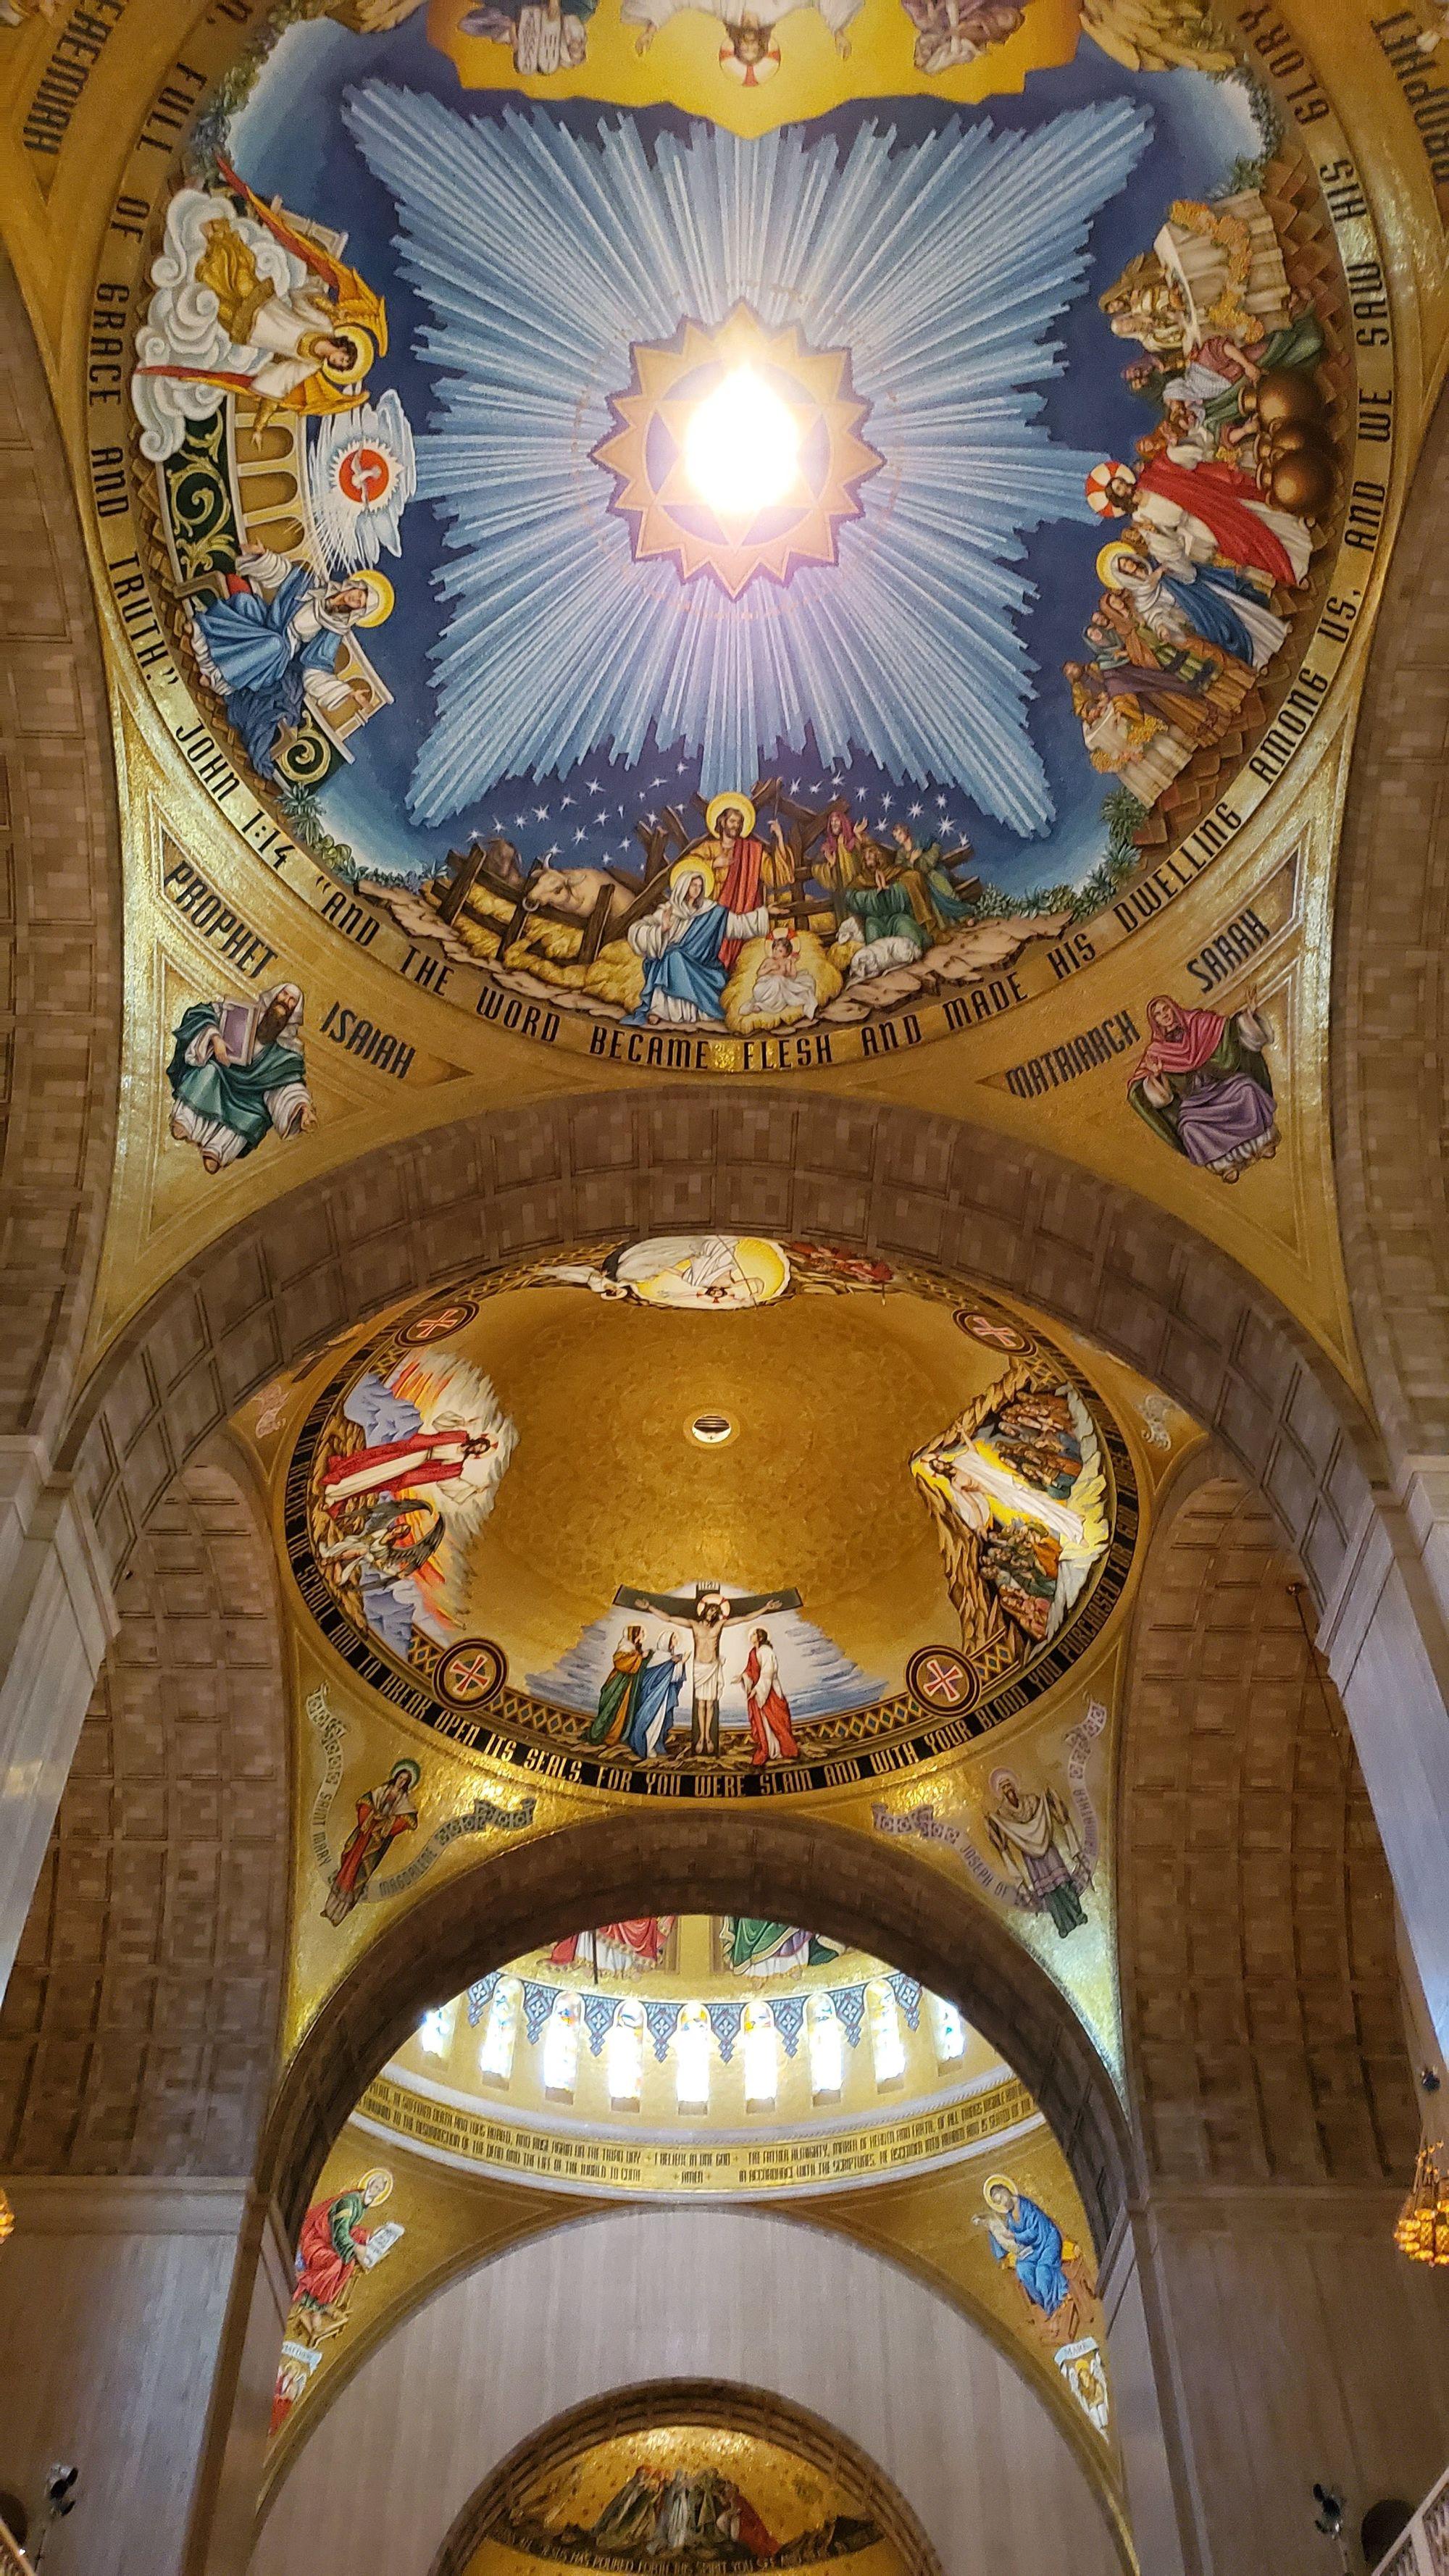 eastern-catholic-church-ceiling-from-sdcason-dot-com